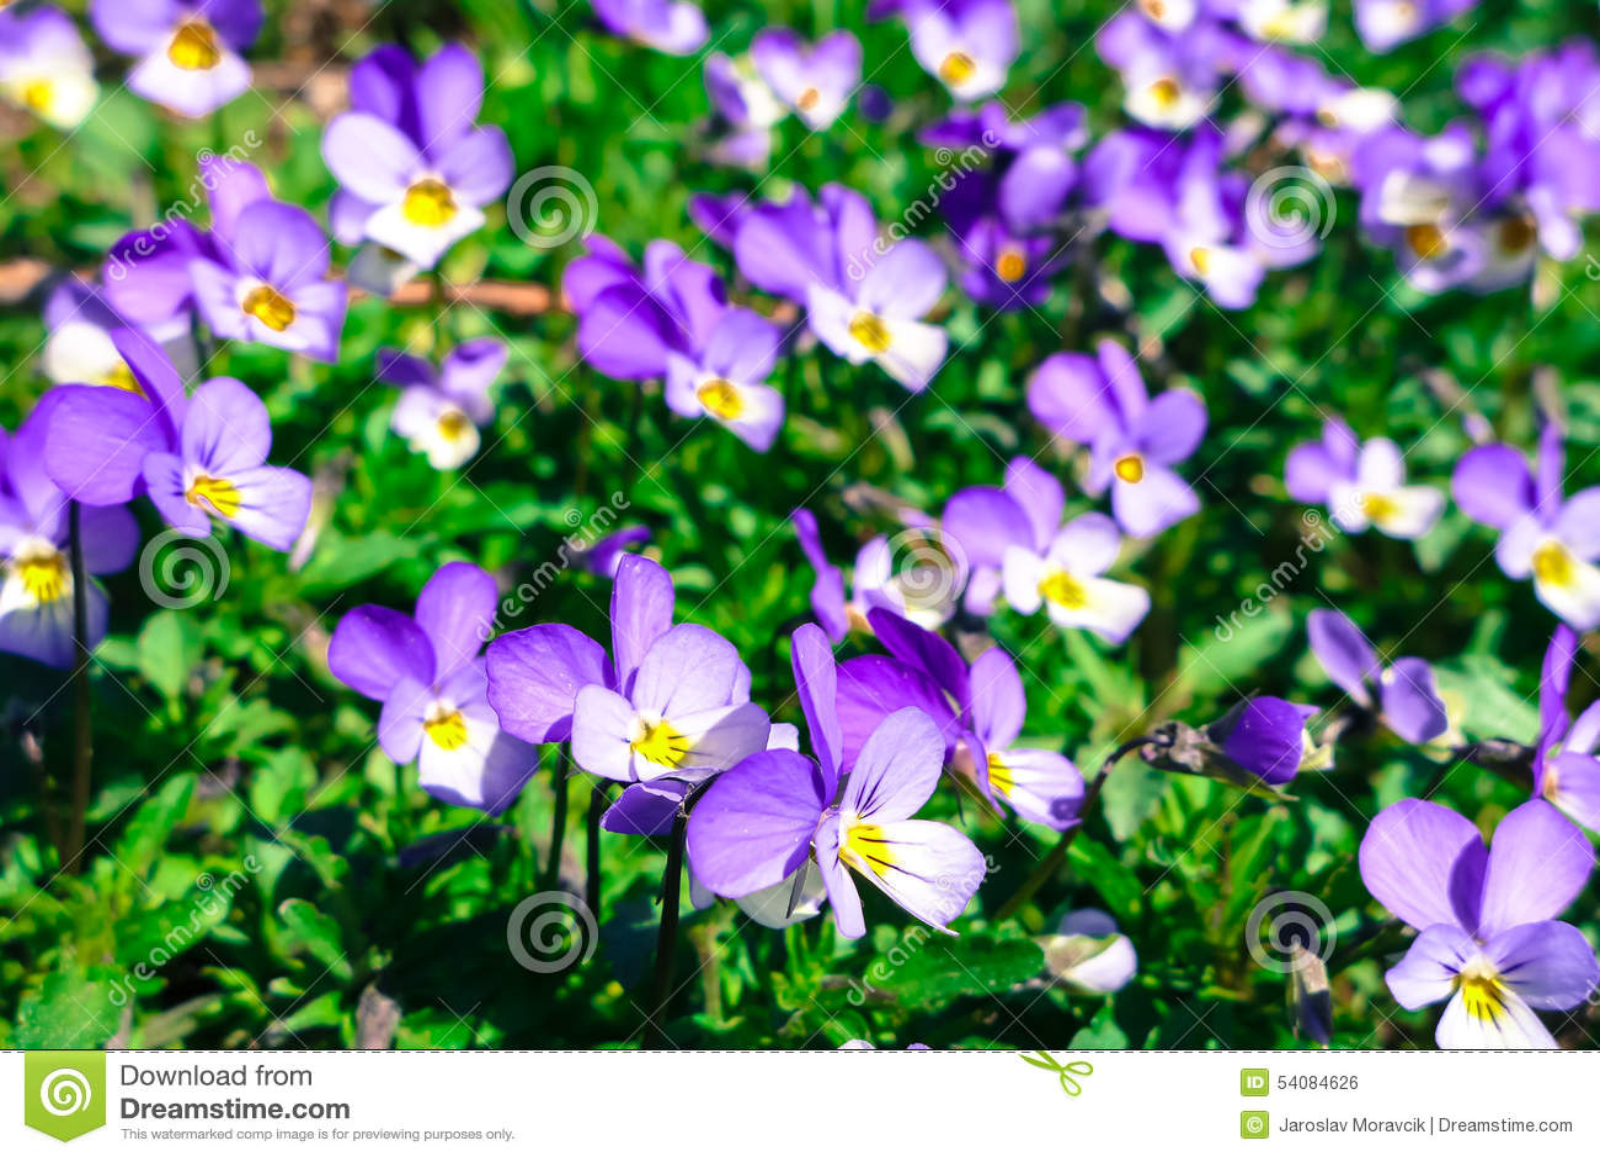 Violette bloem